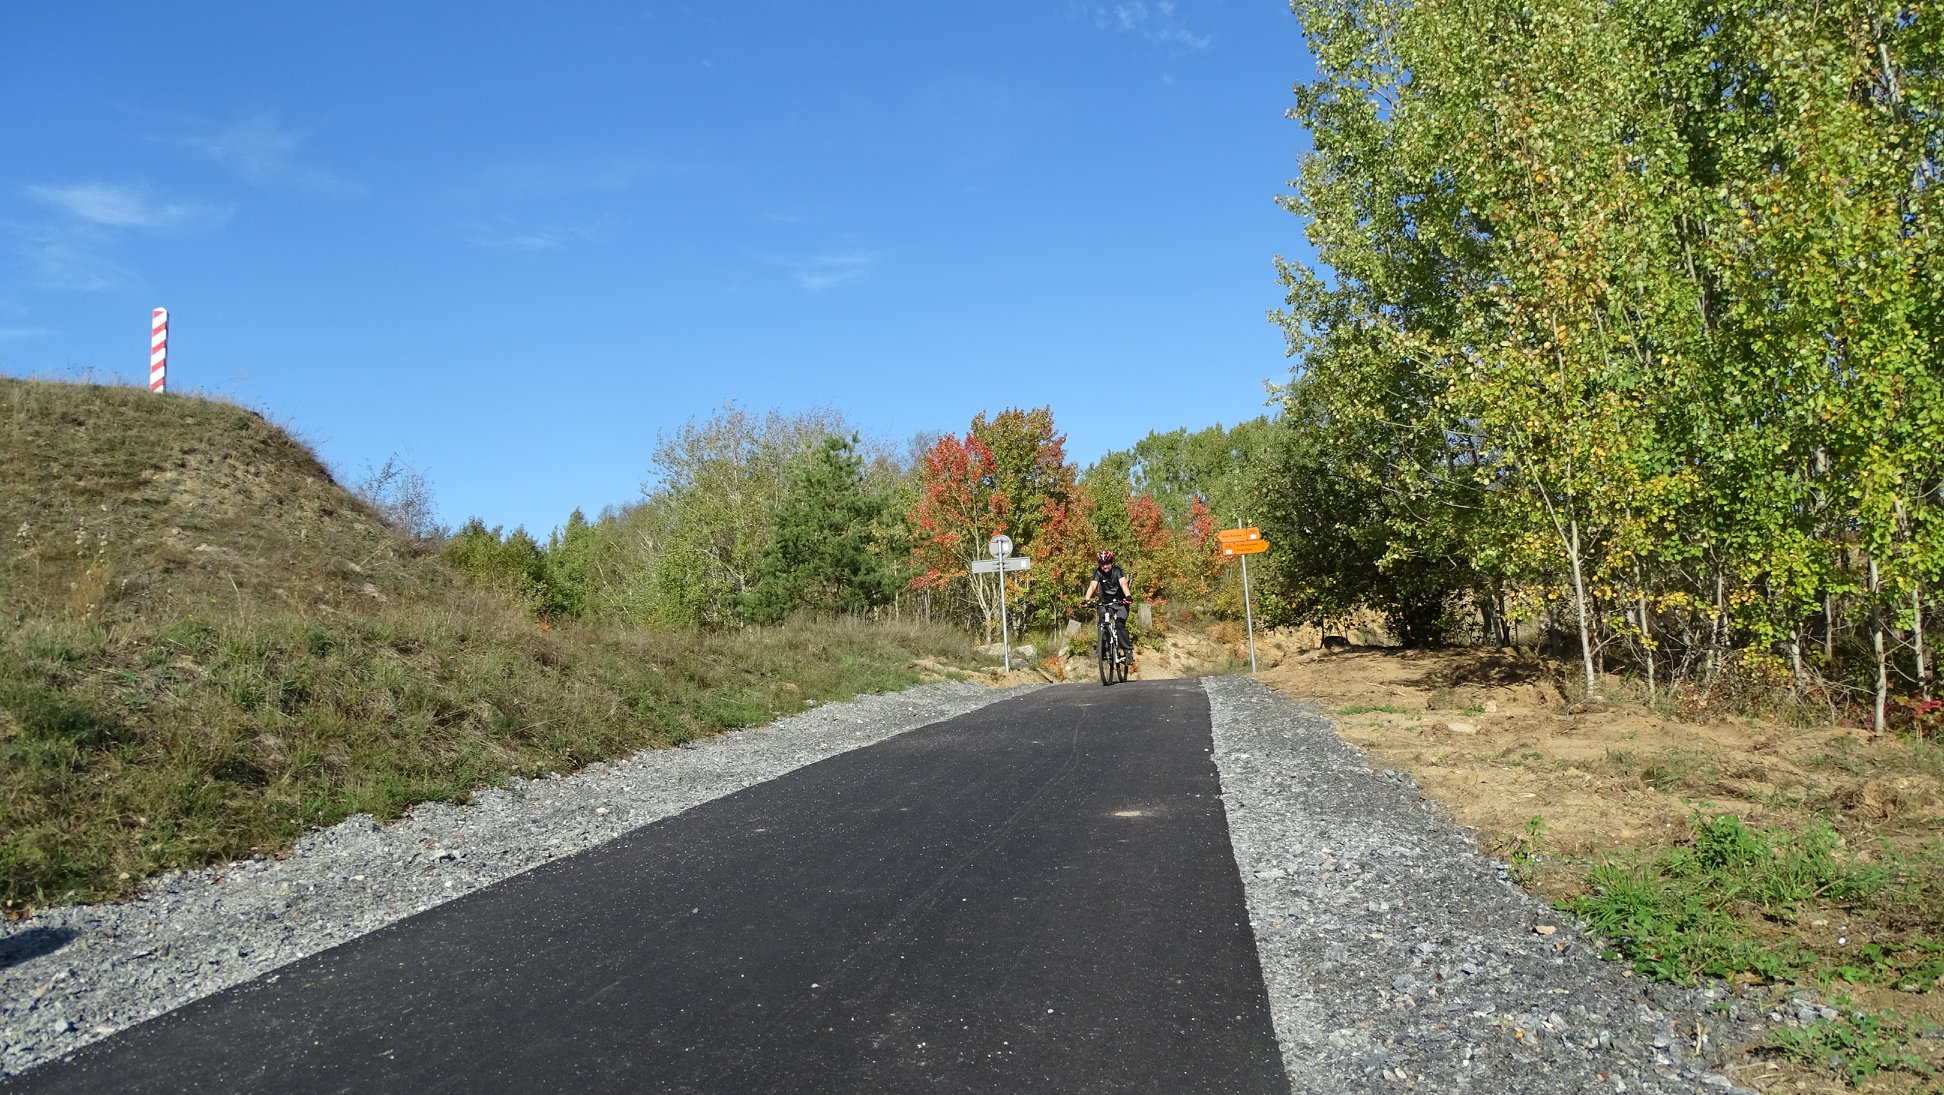 droga rowerowa Rosówek granica